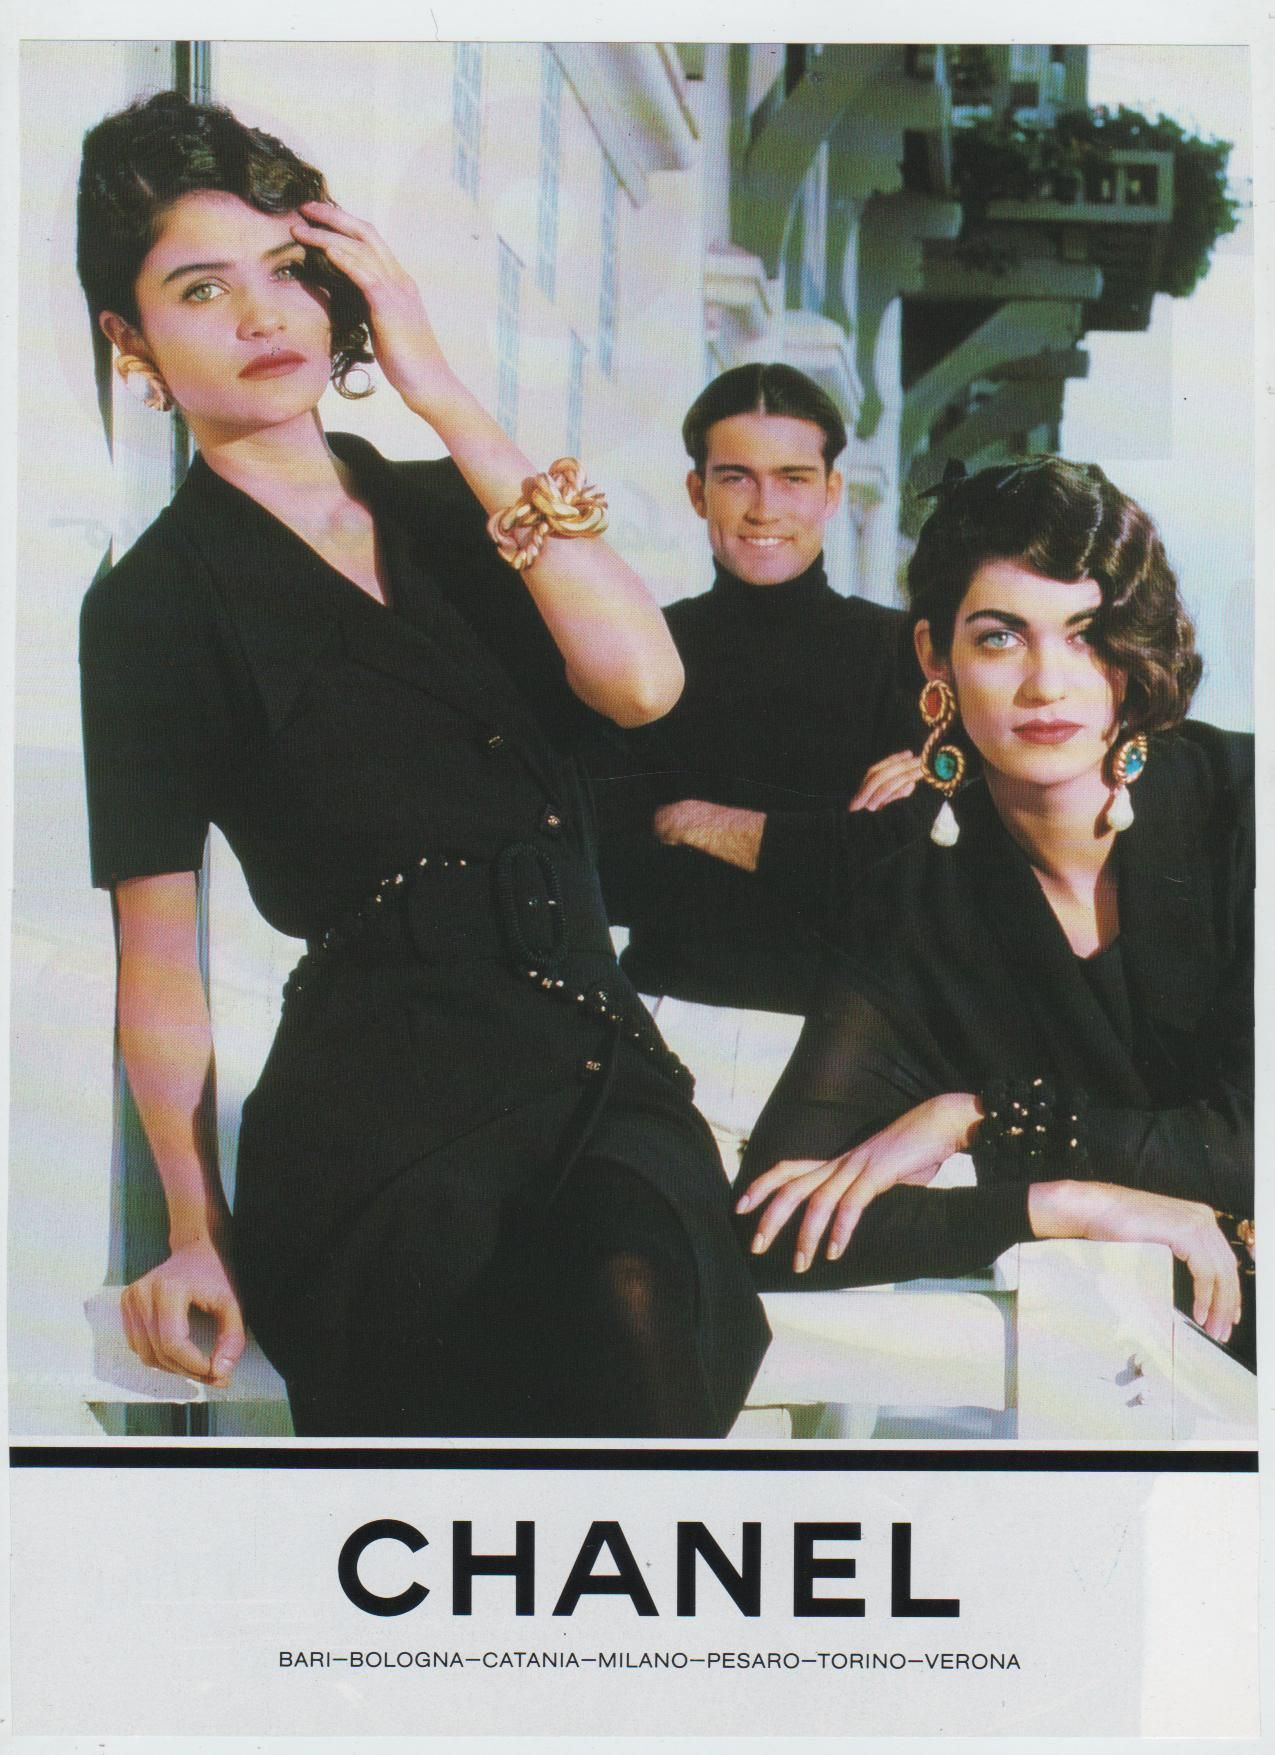 Chanel ad 1990 Helen Christensen | Chanel | Pinterest ...